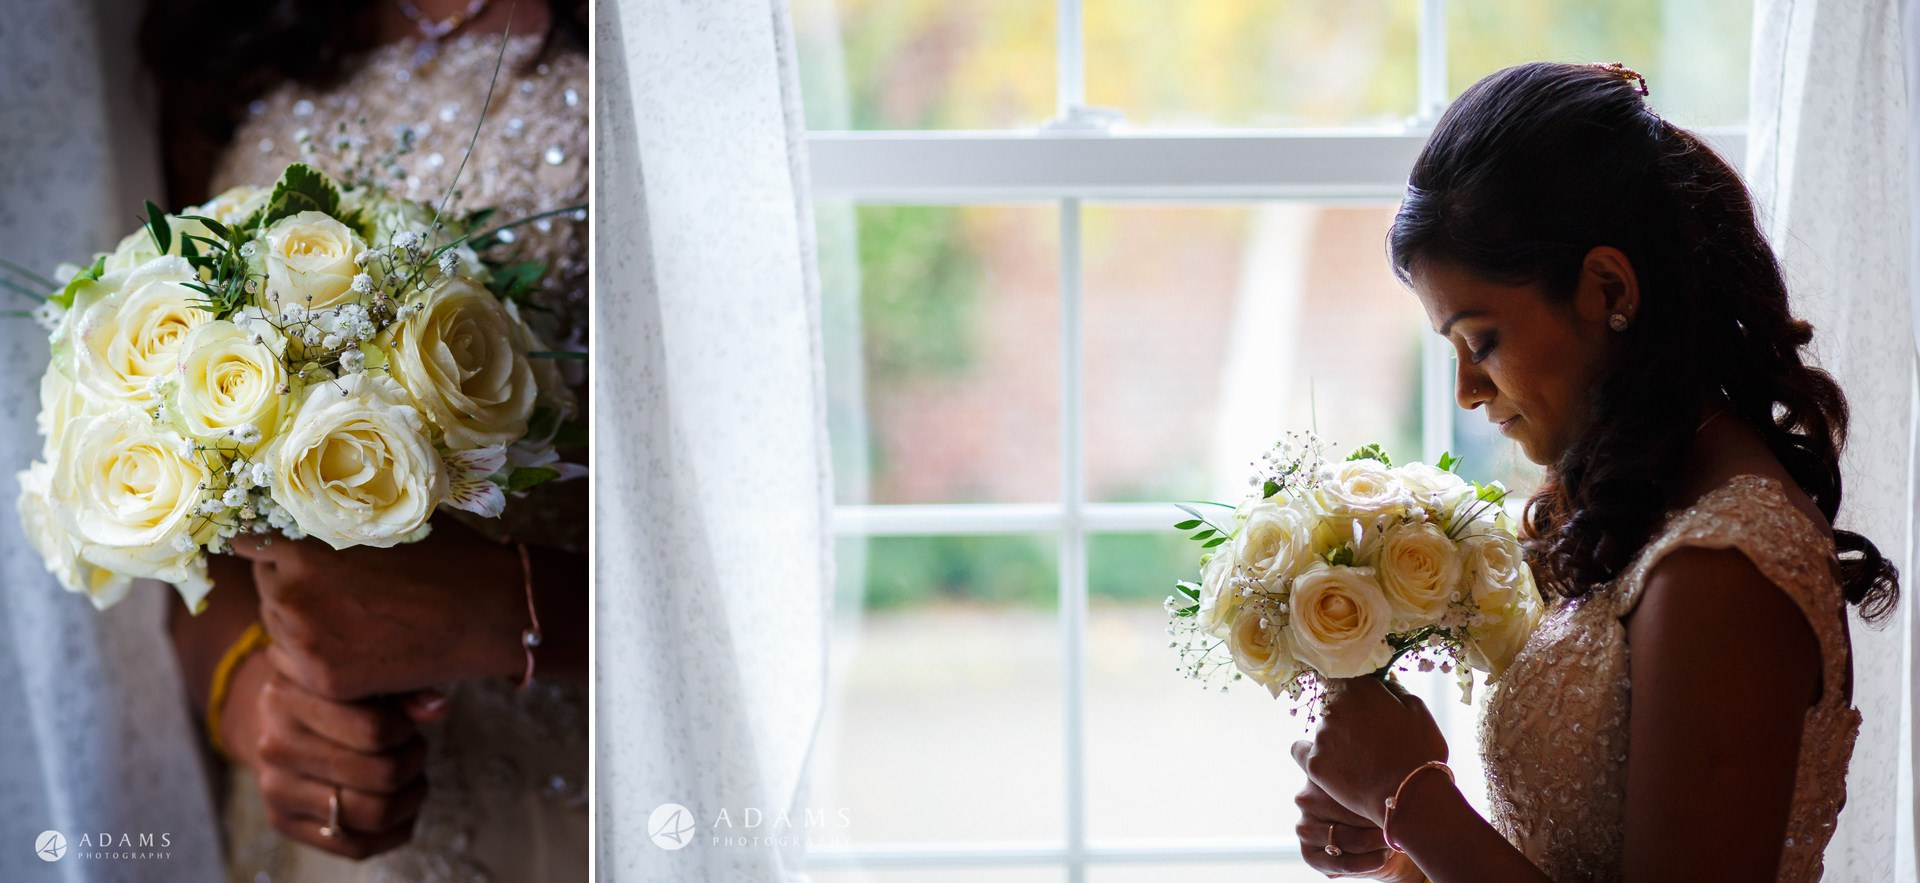 Baylis House Wedding Photographer | Sara + Anojan 5